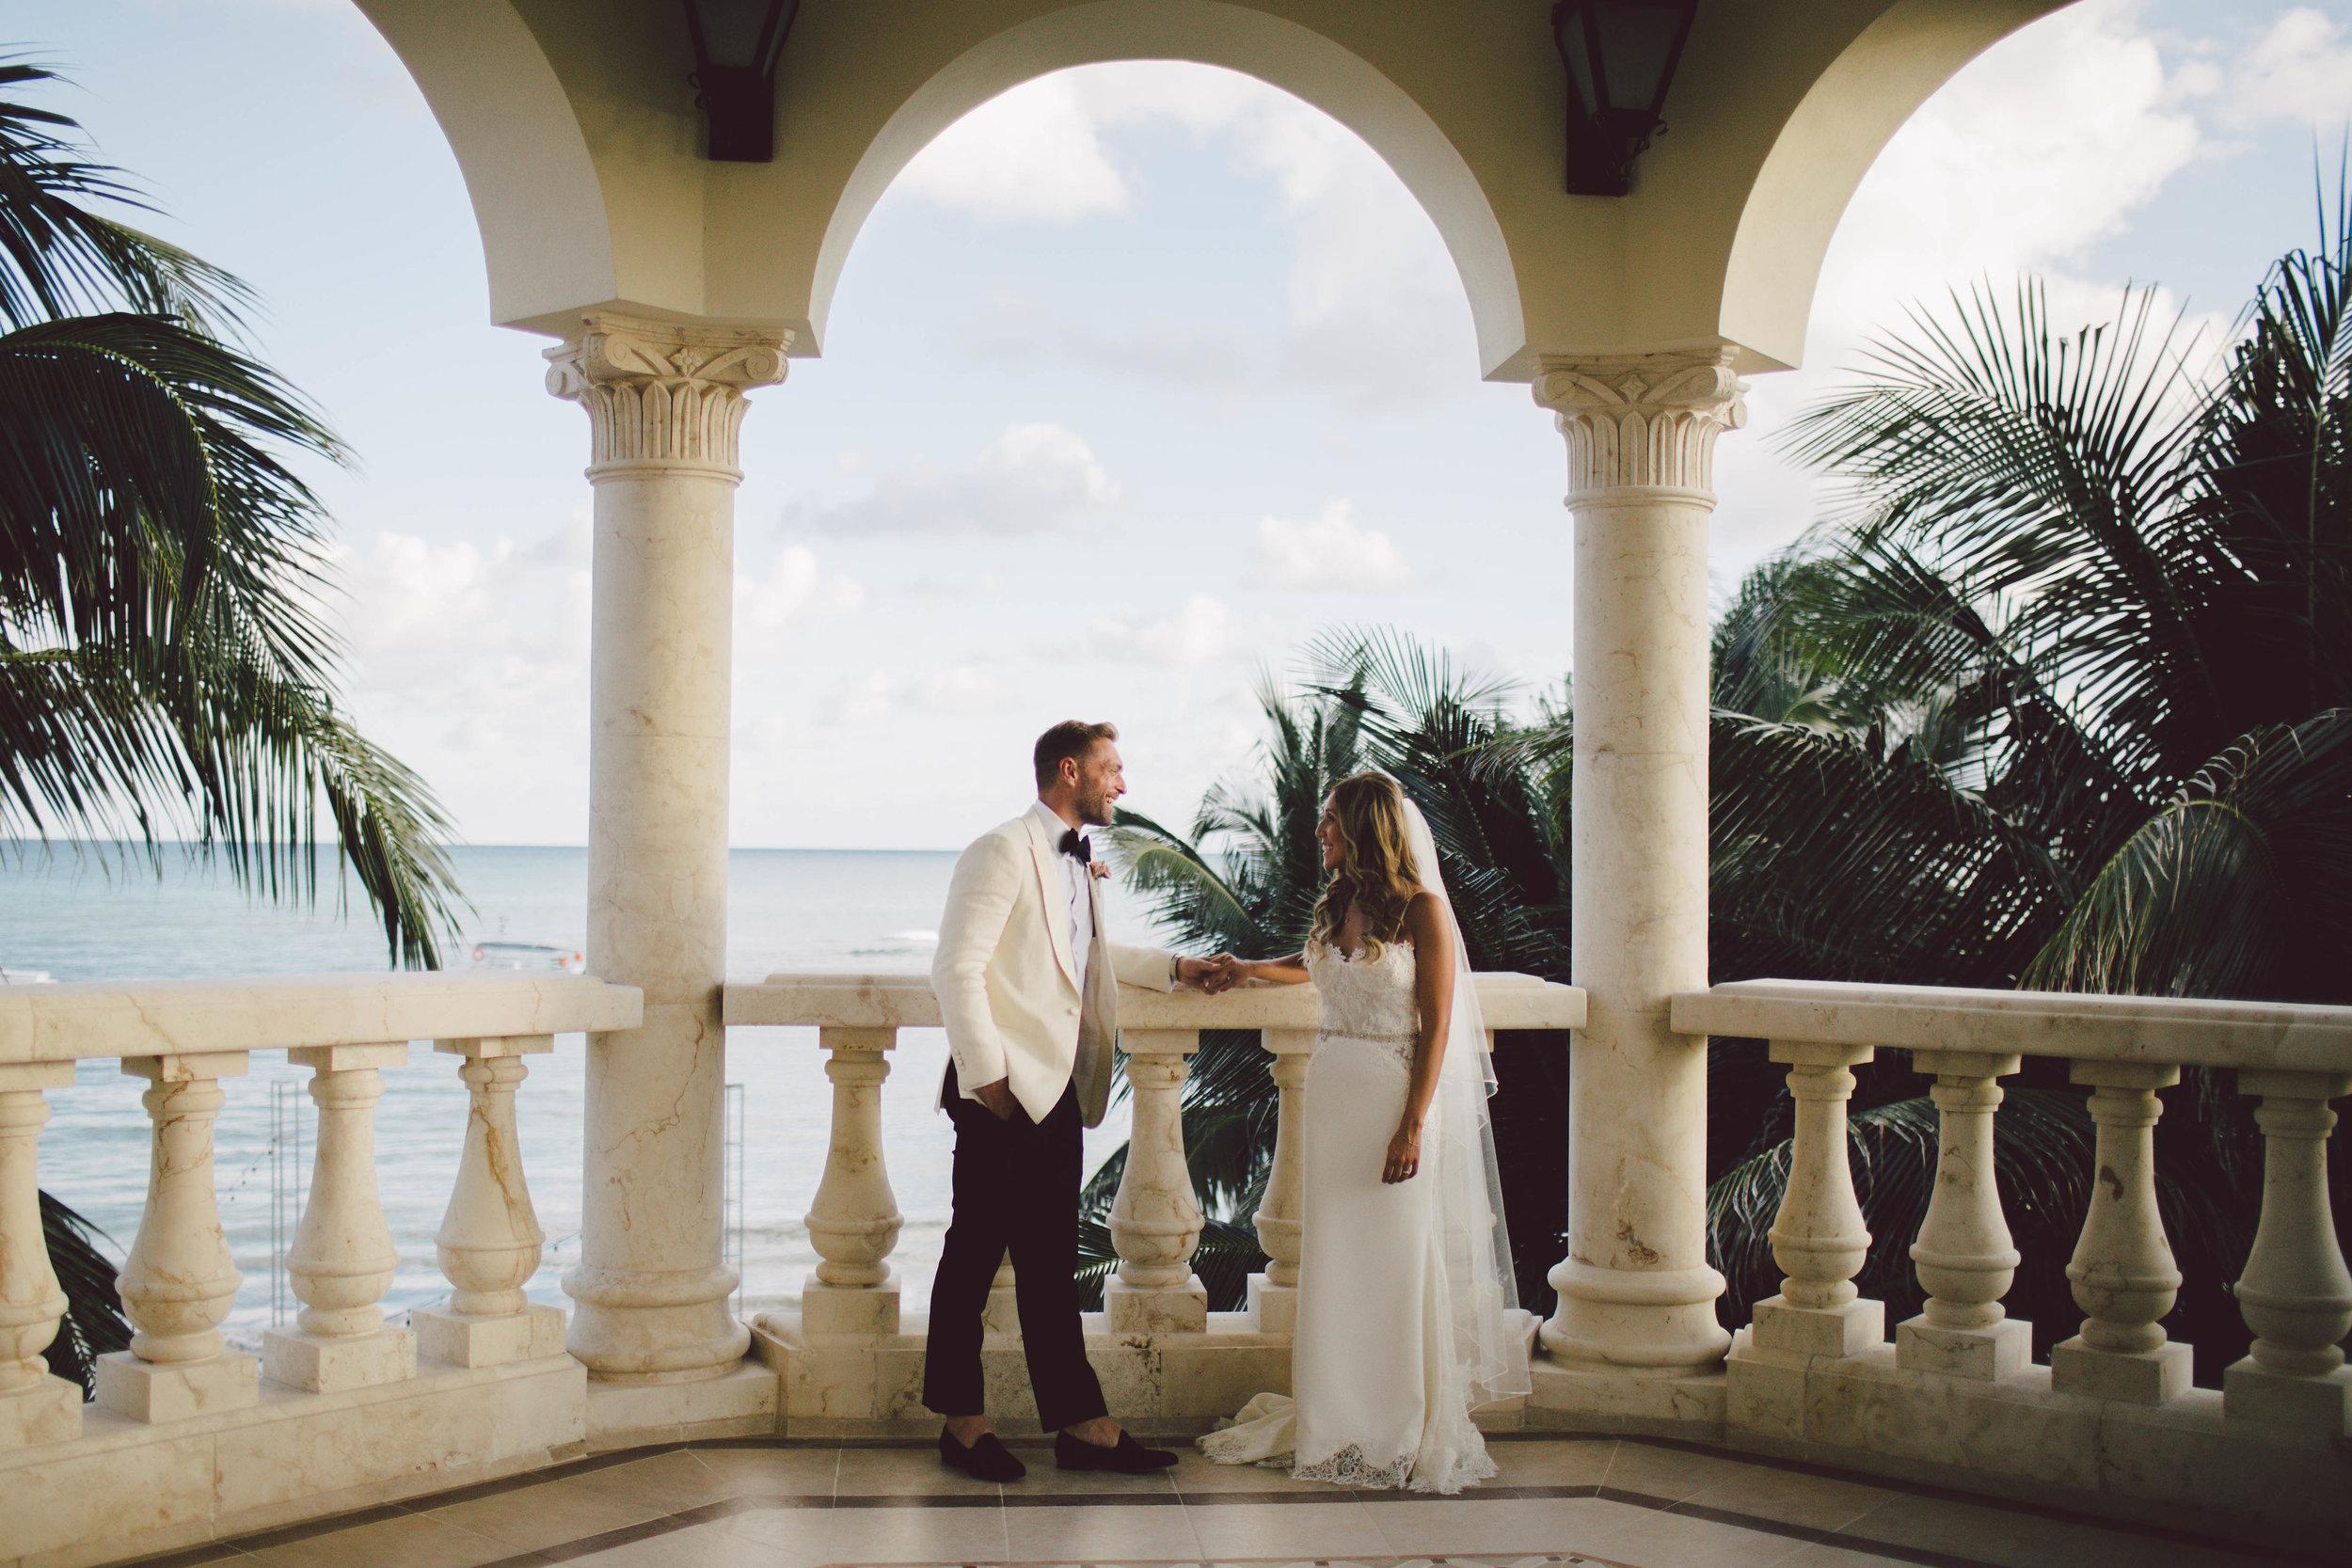 mexico_wedding_cancun_villa_la_joya_evangeline_lane_092.jpg